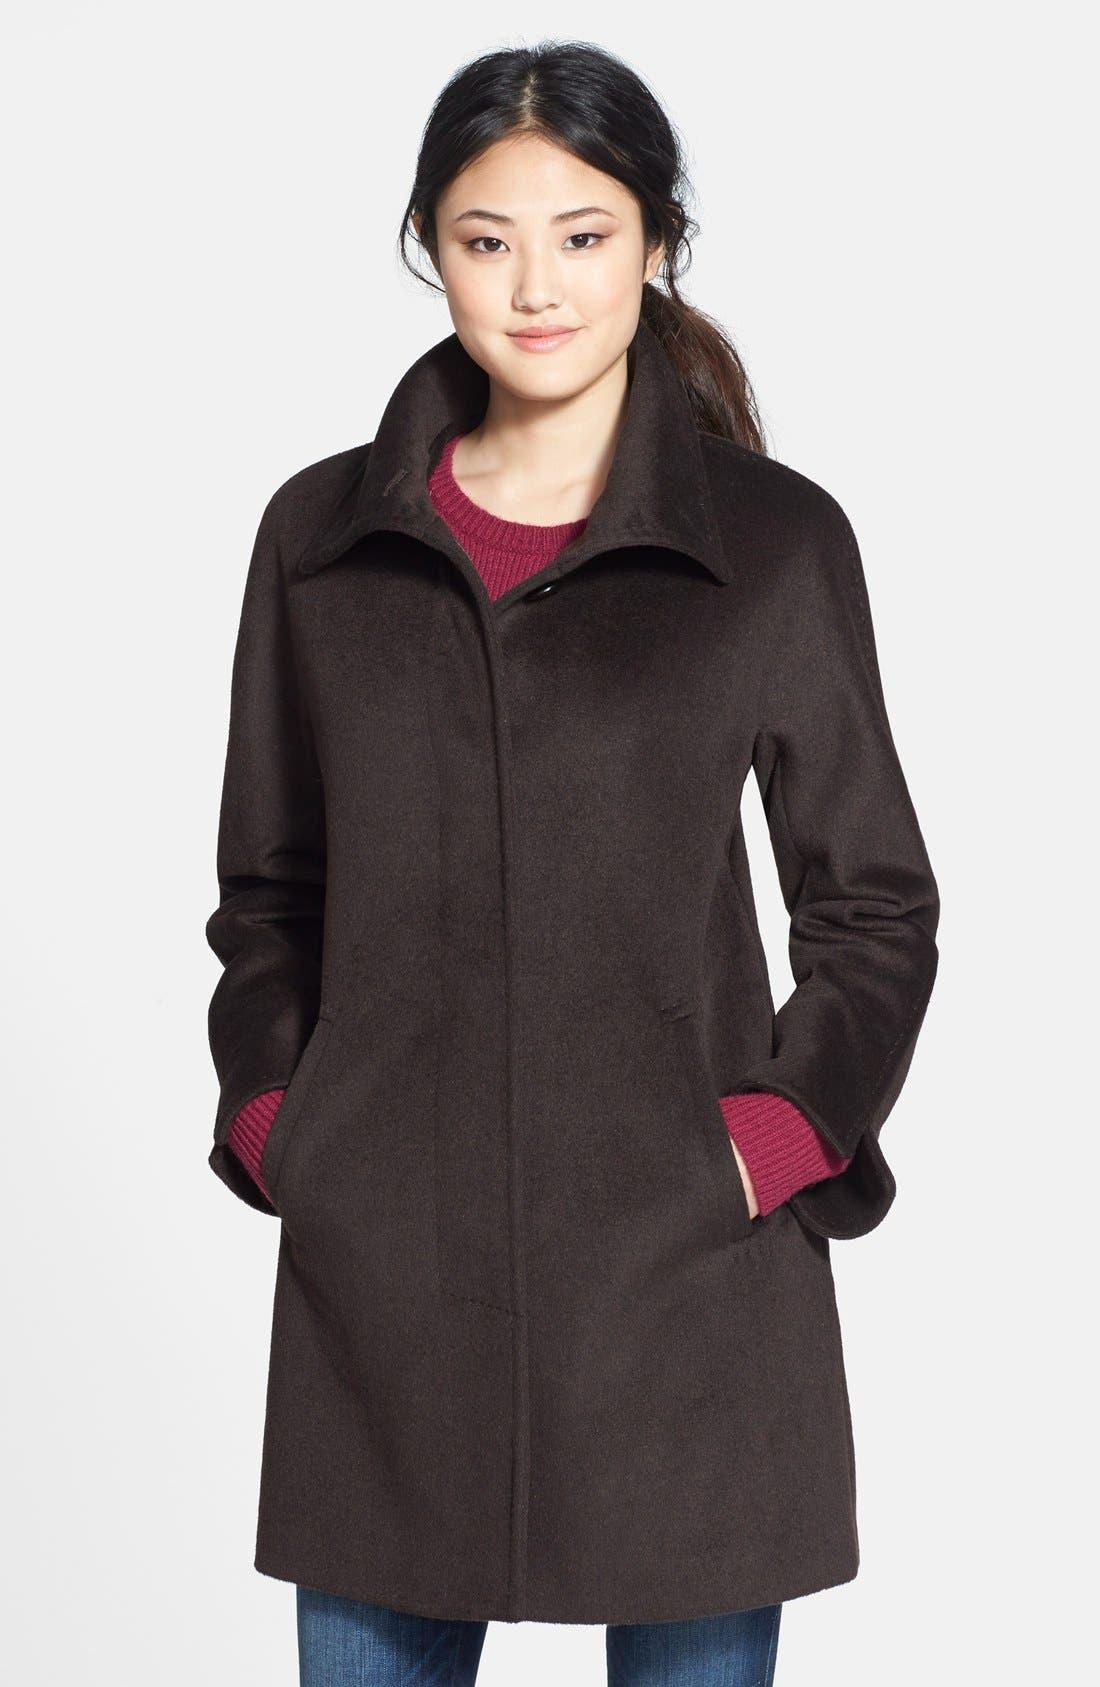 Main Image - Ellen Tracy Funnel Collar Wool Blend Topper (Regular & Petite) (Nordstrom Exclusive)